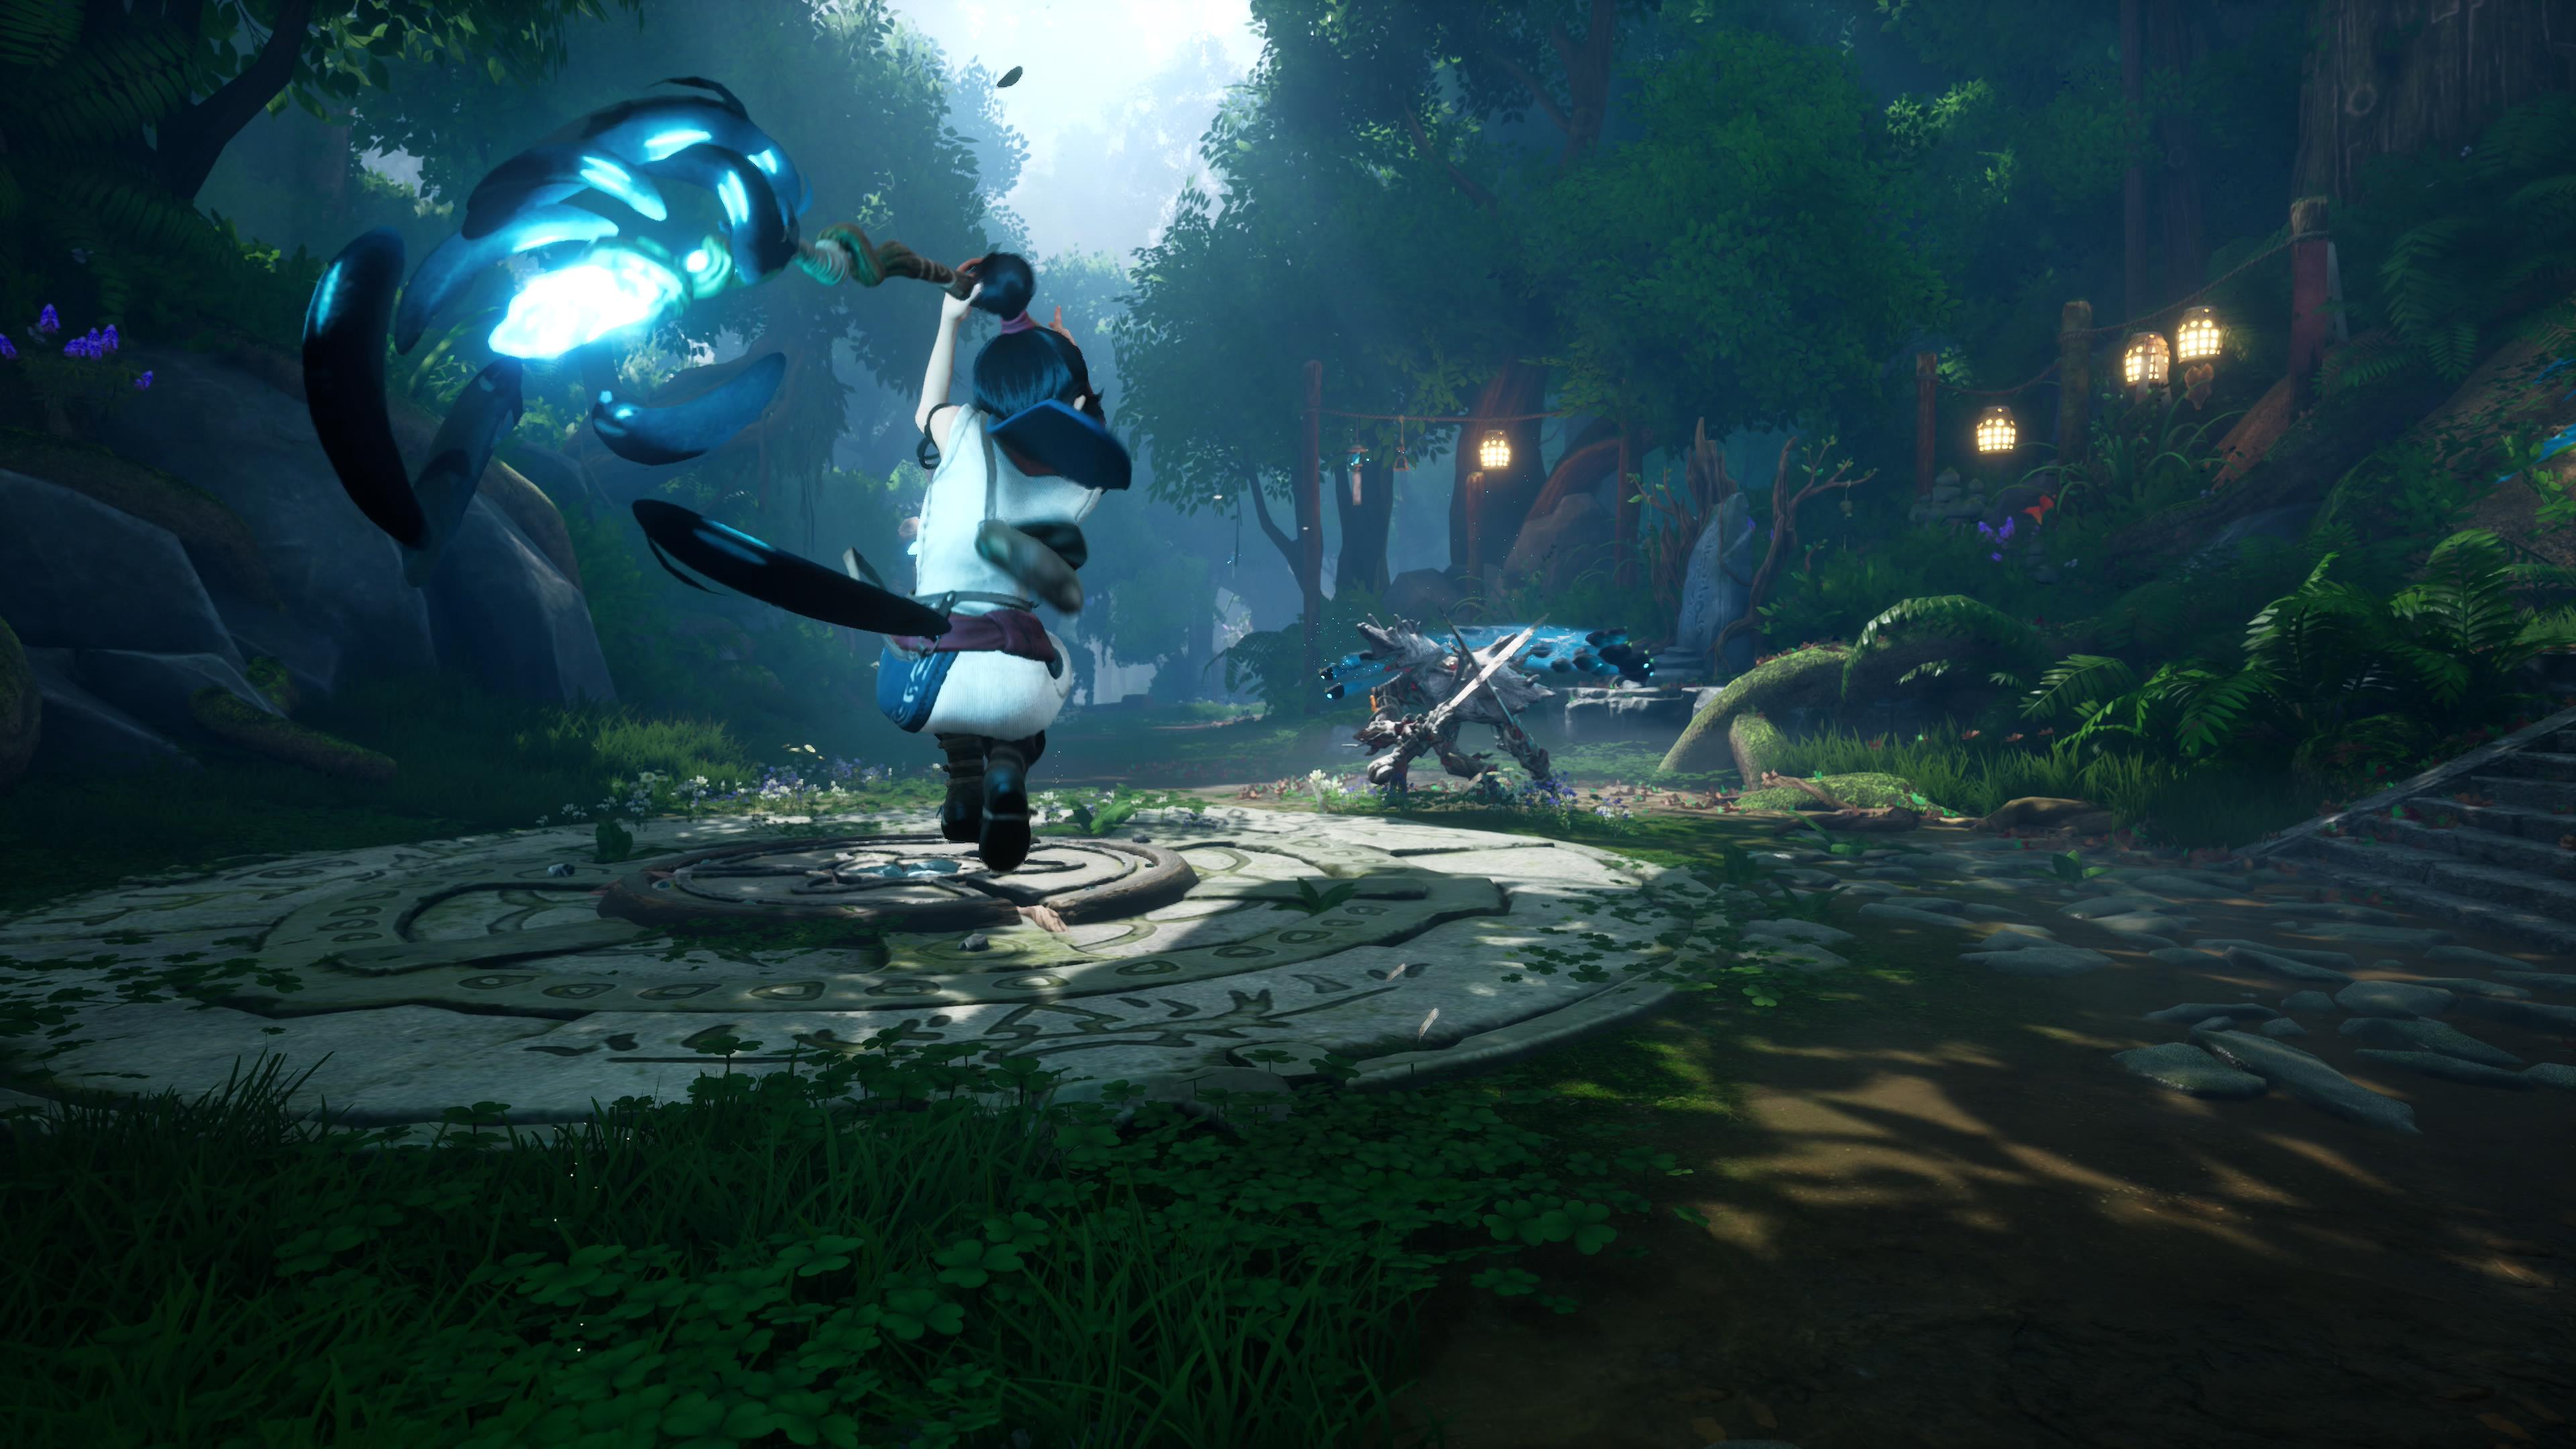 Скриншот №9 к Kena Bridge of Spirits Digital Deluxe PS4 and PS5